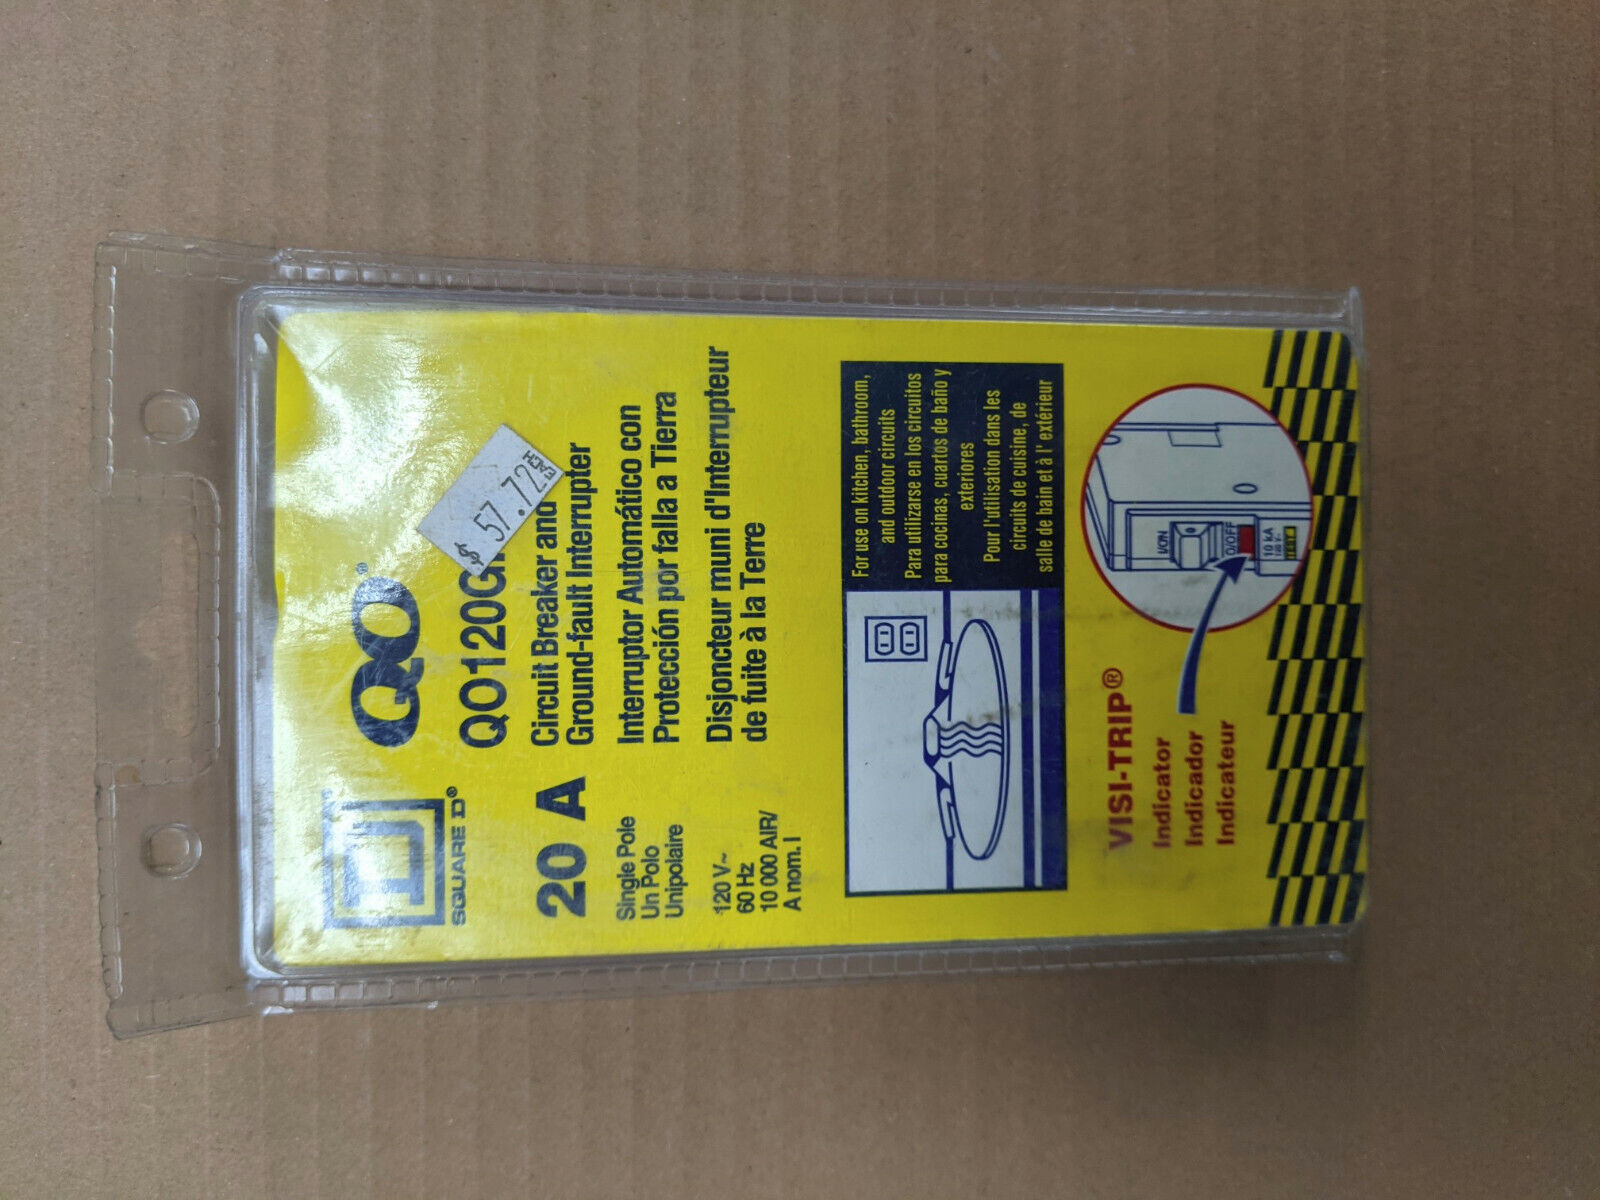 Square D QO120PCAFI 20 Amp 1 Pole Circuit Breaker Ground Fault Interrupter 20a for sale online